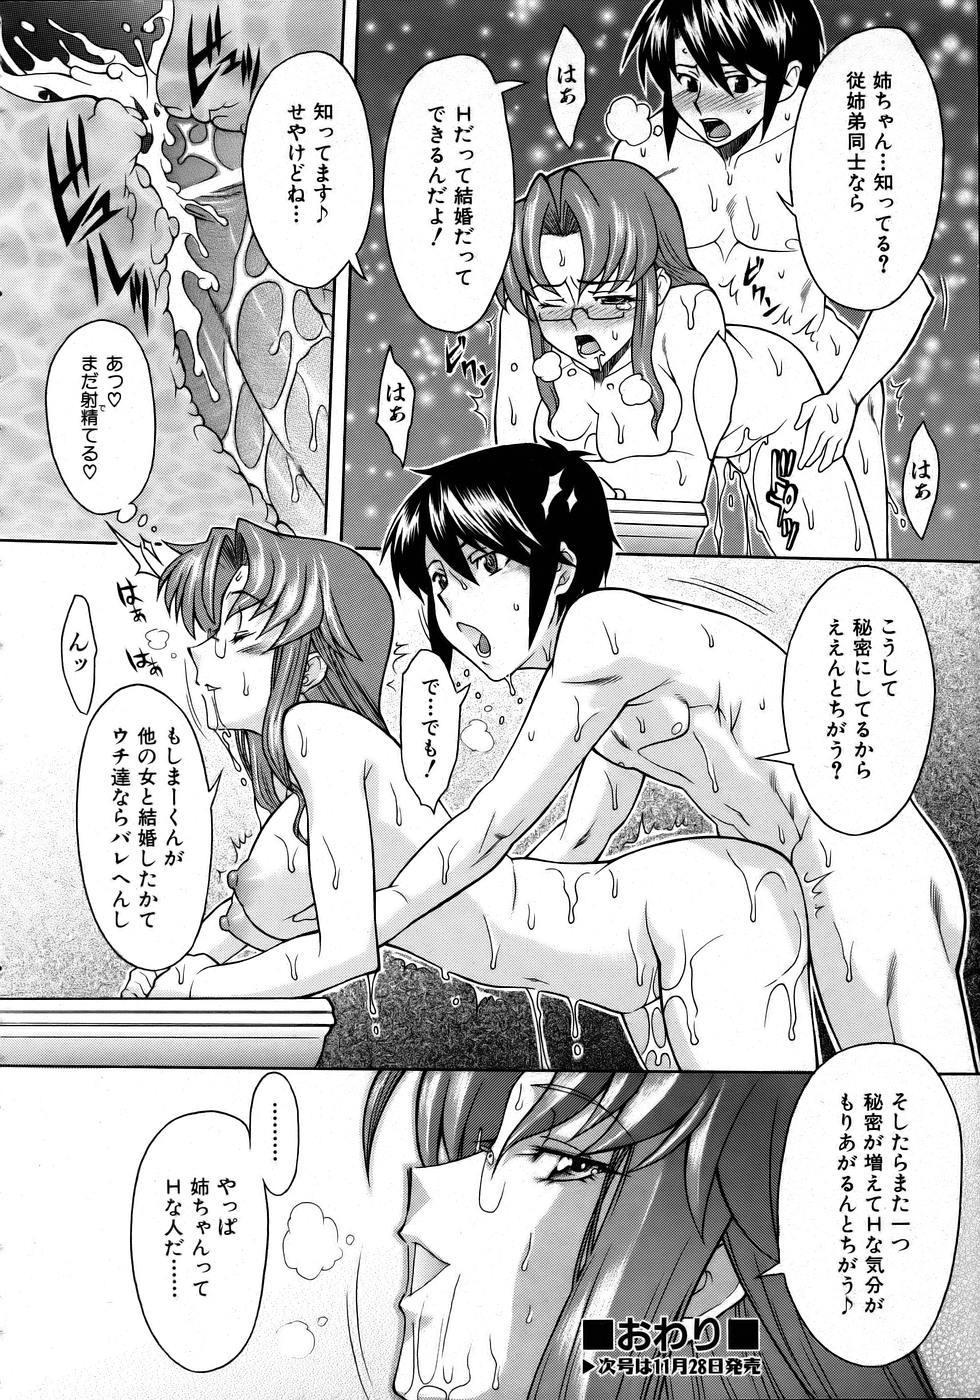 COMIC AUN 2005-12 Vol. 115 107